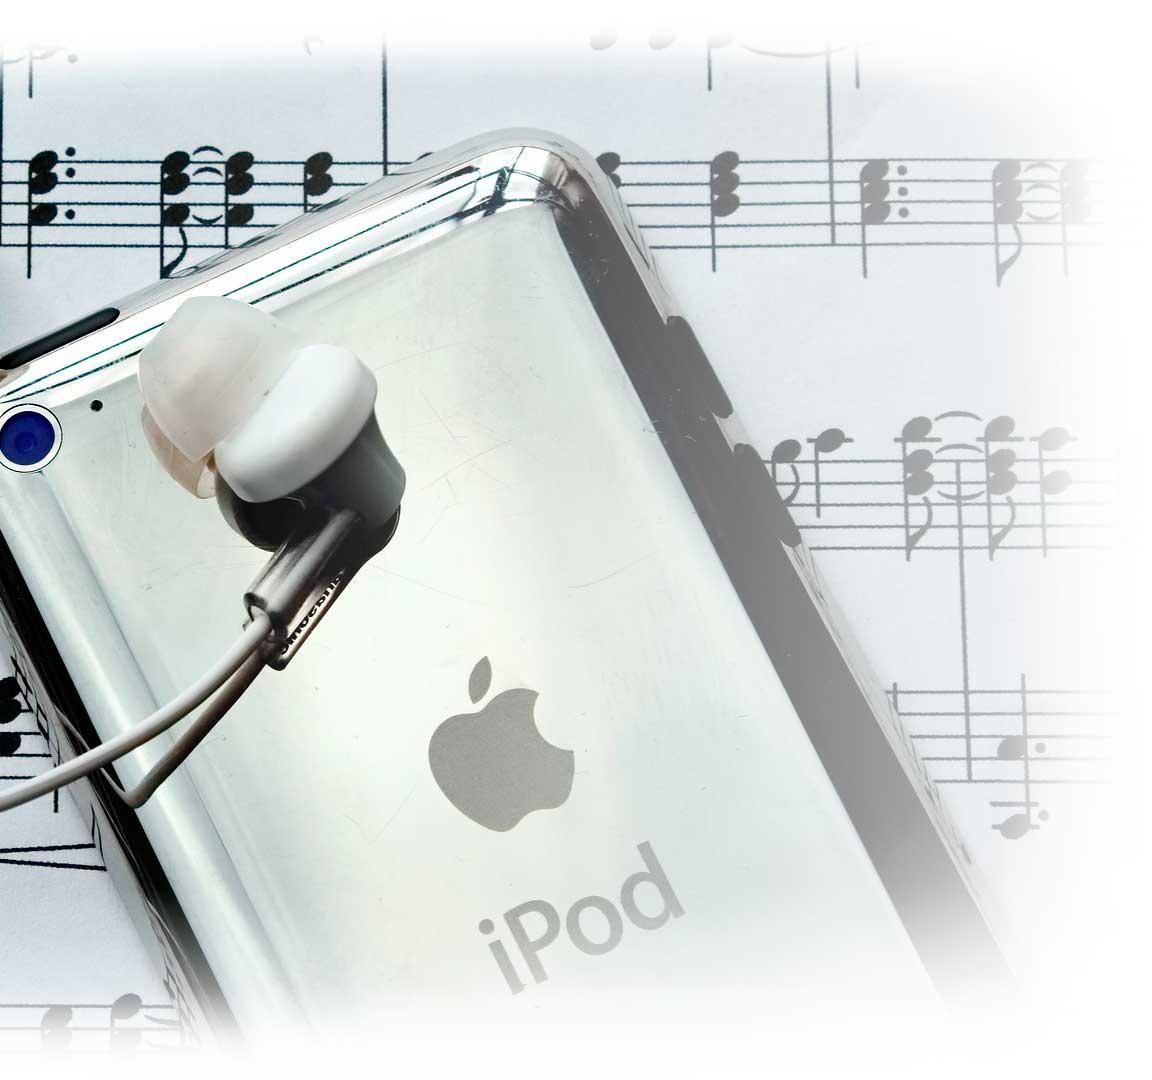 Classical music improves endurance